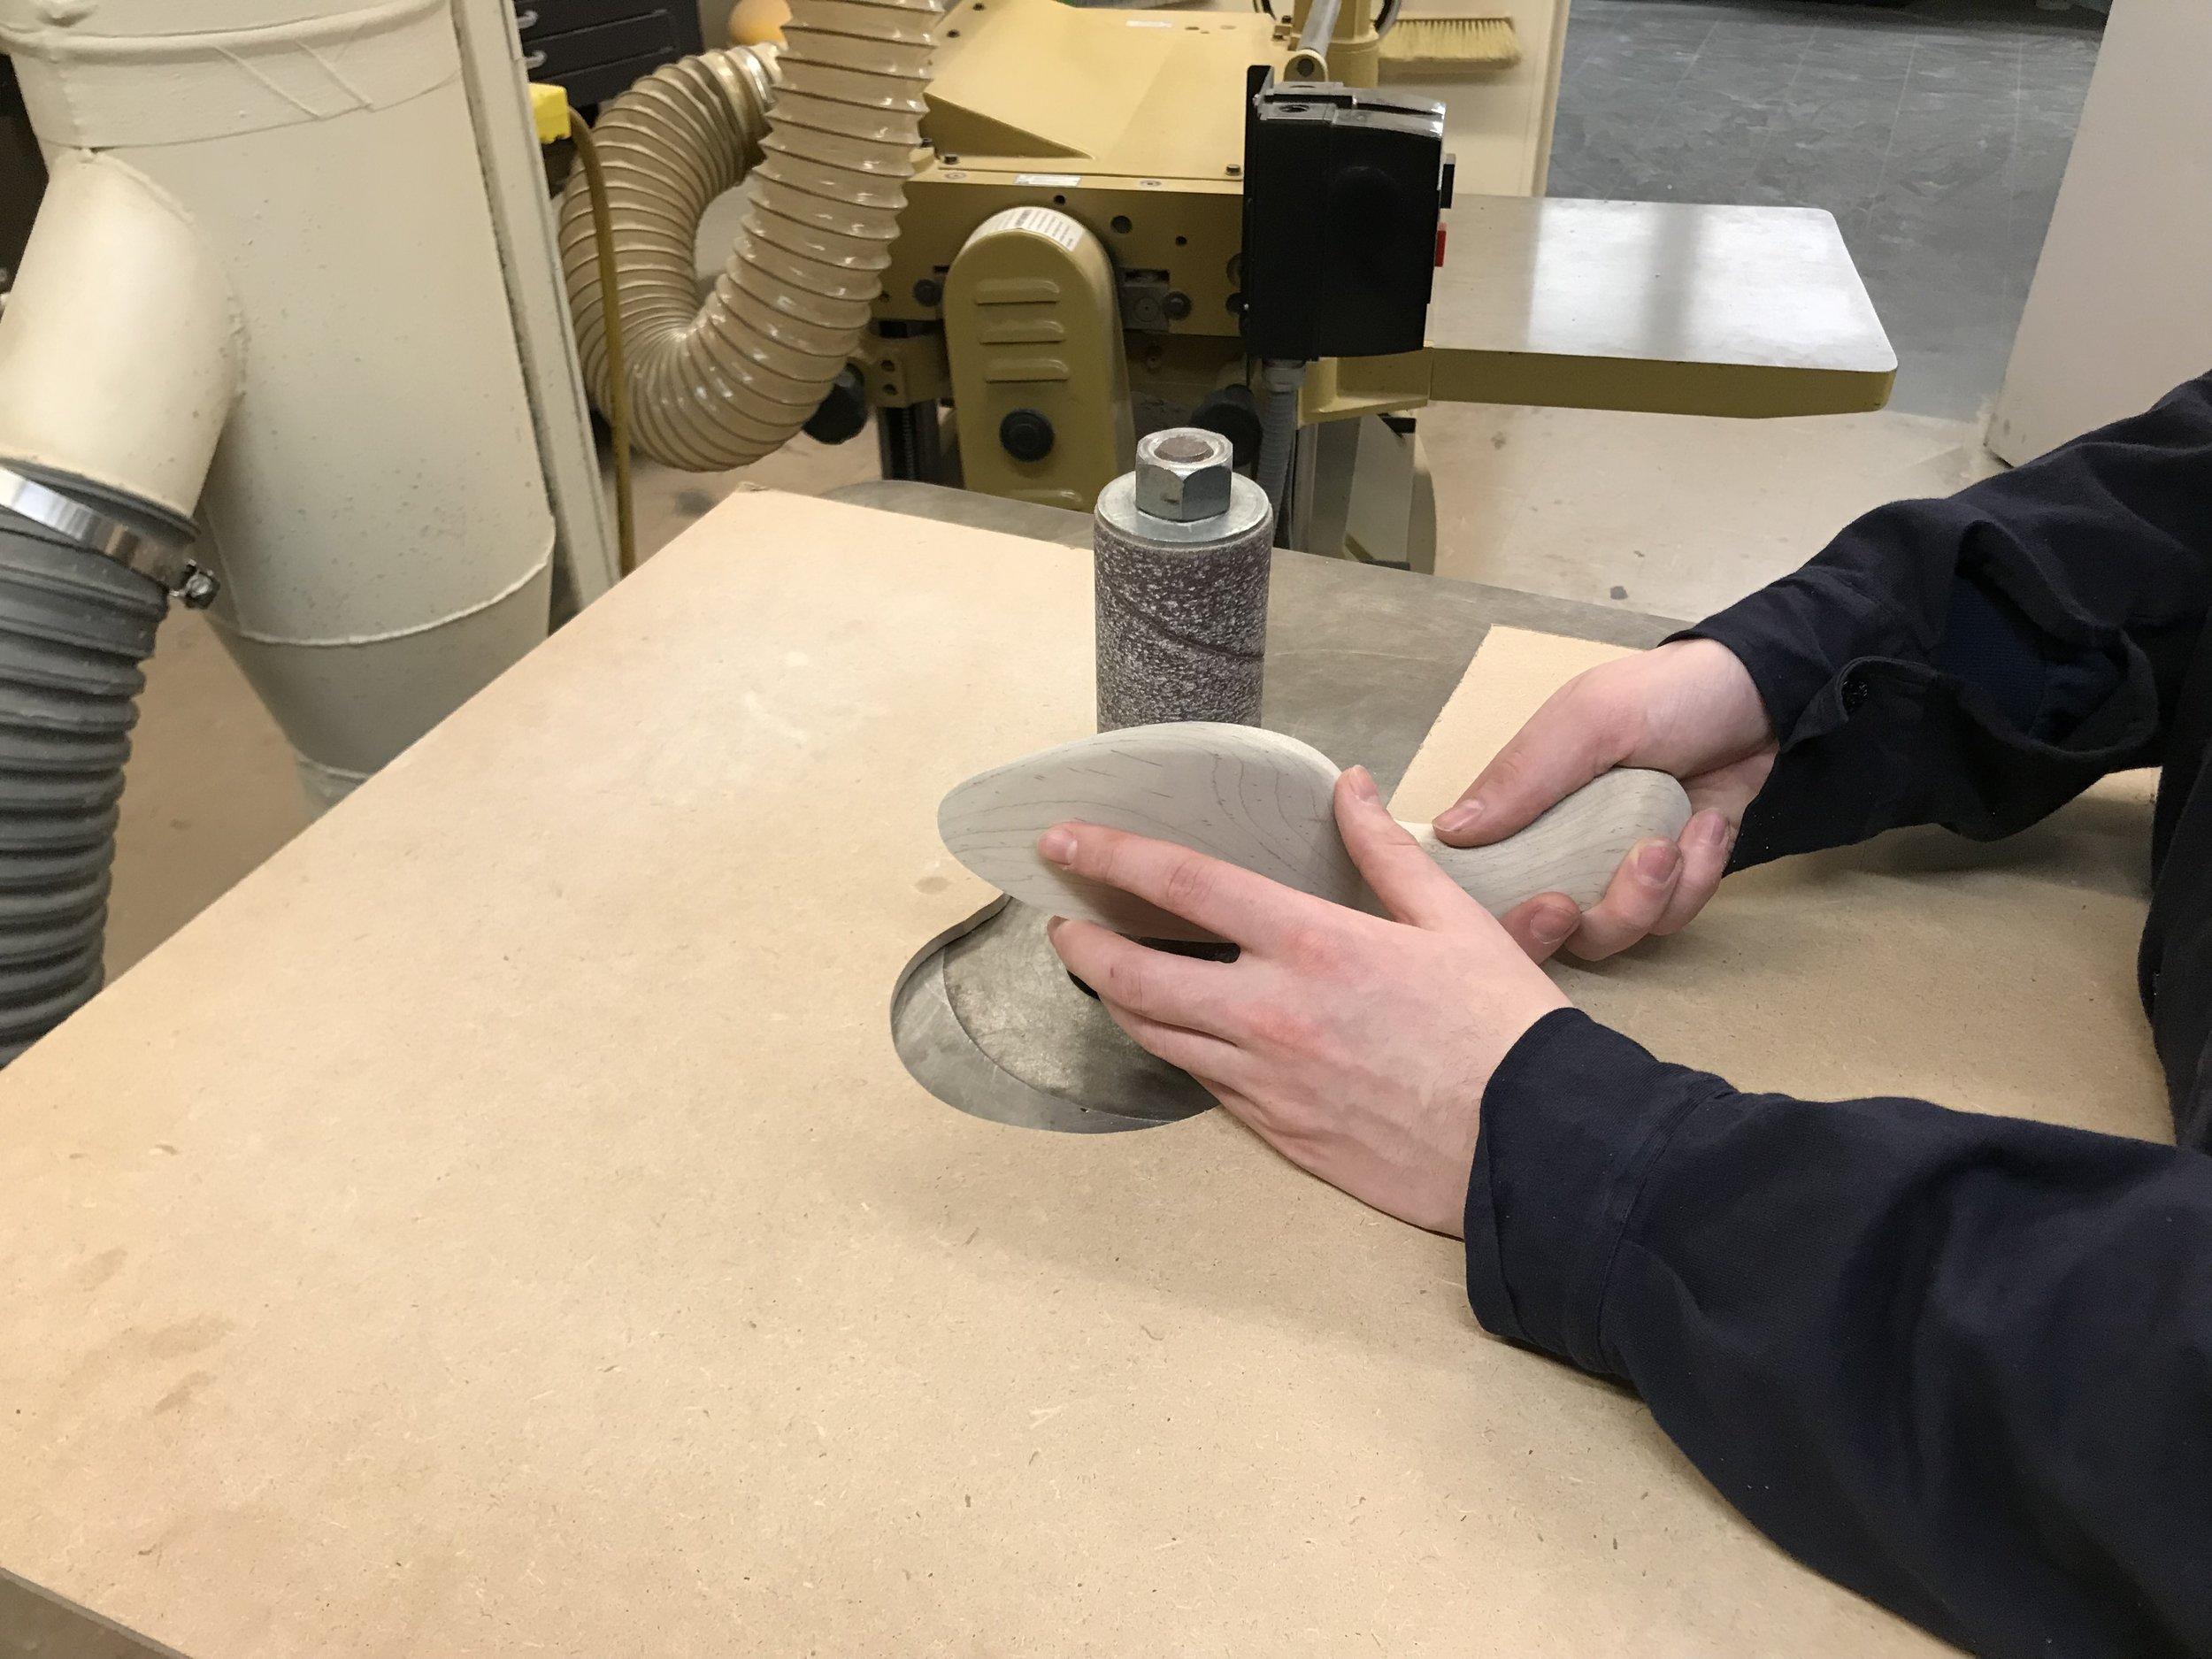 rough machine sanding